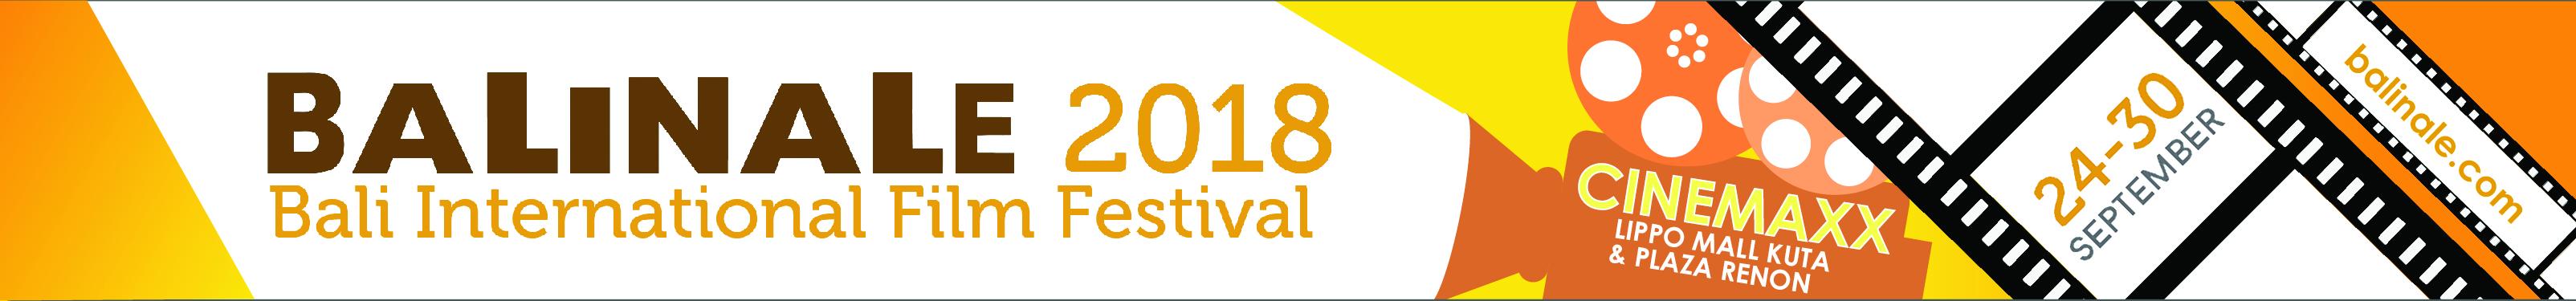 Balinale2018 Web Banner